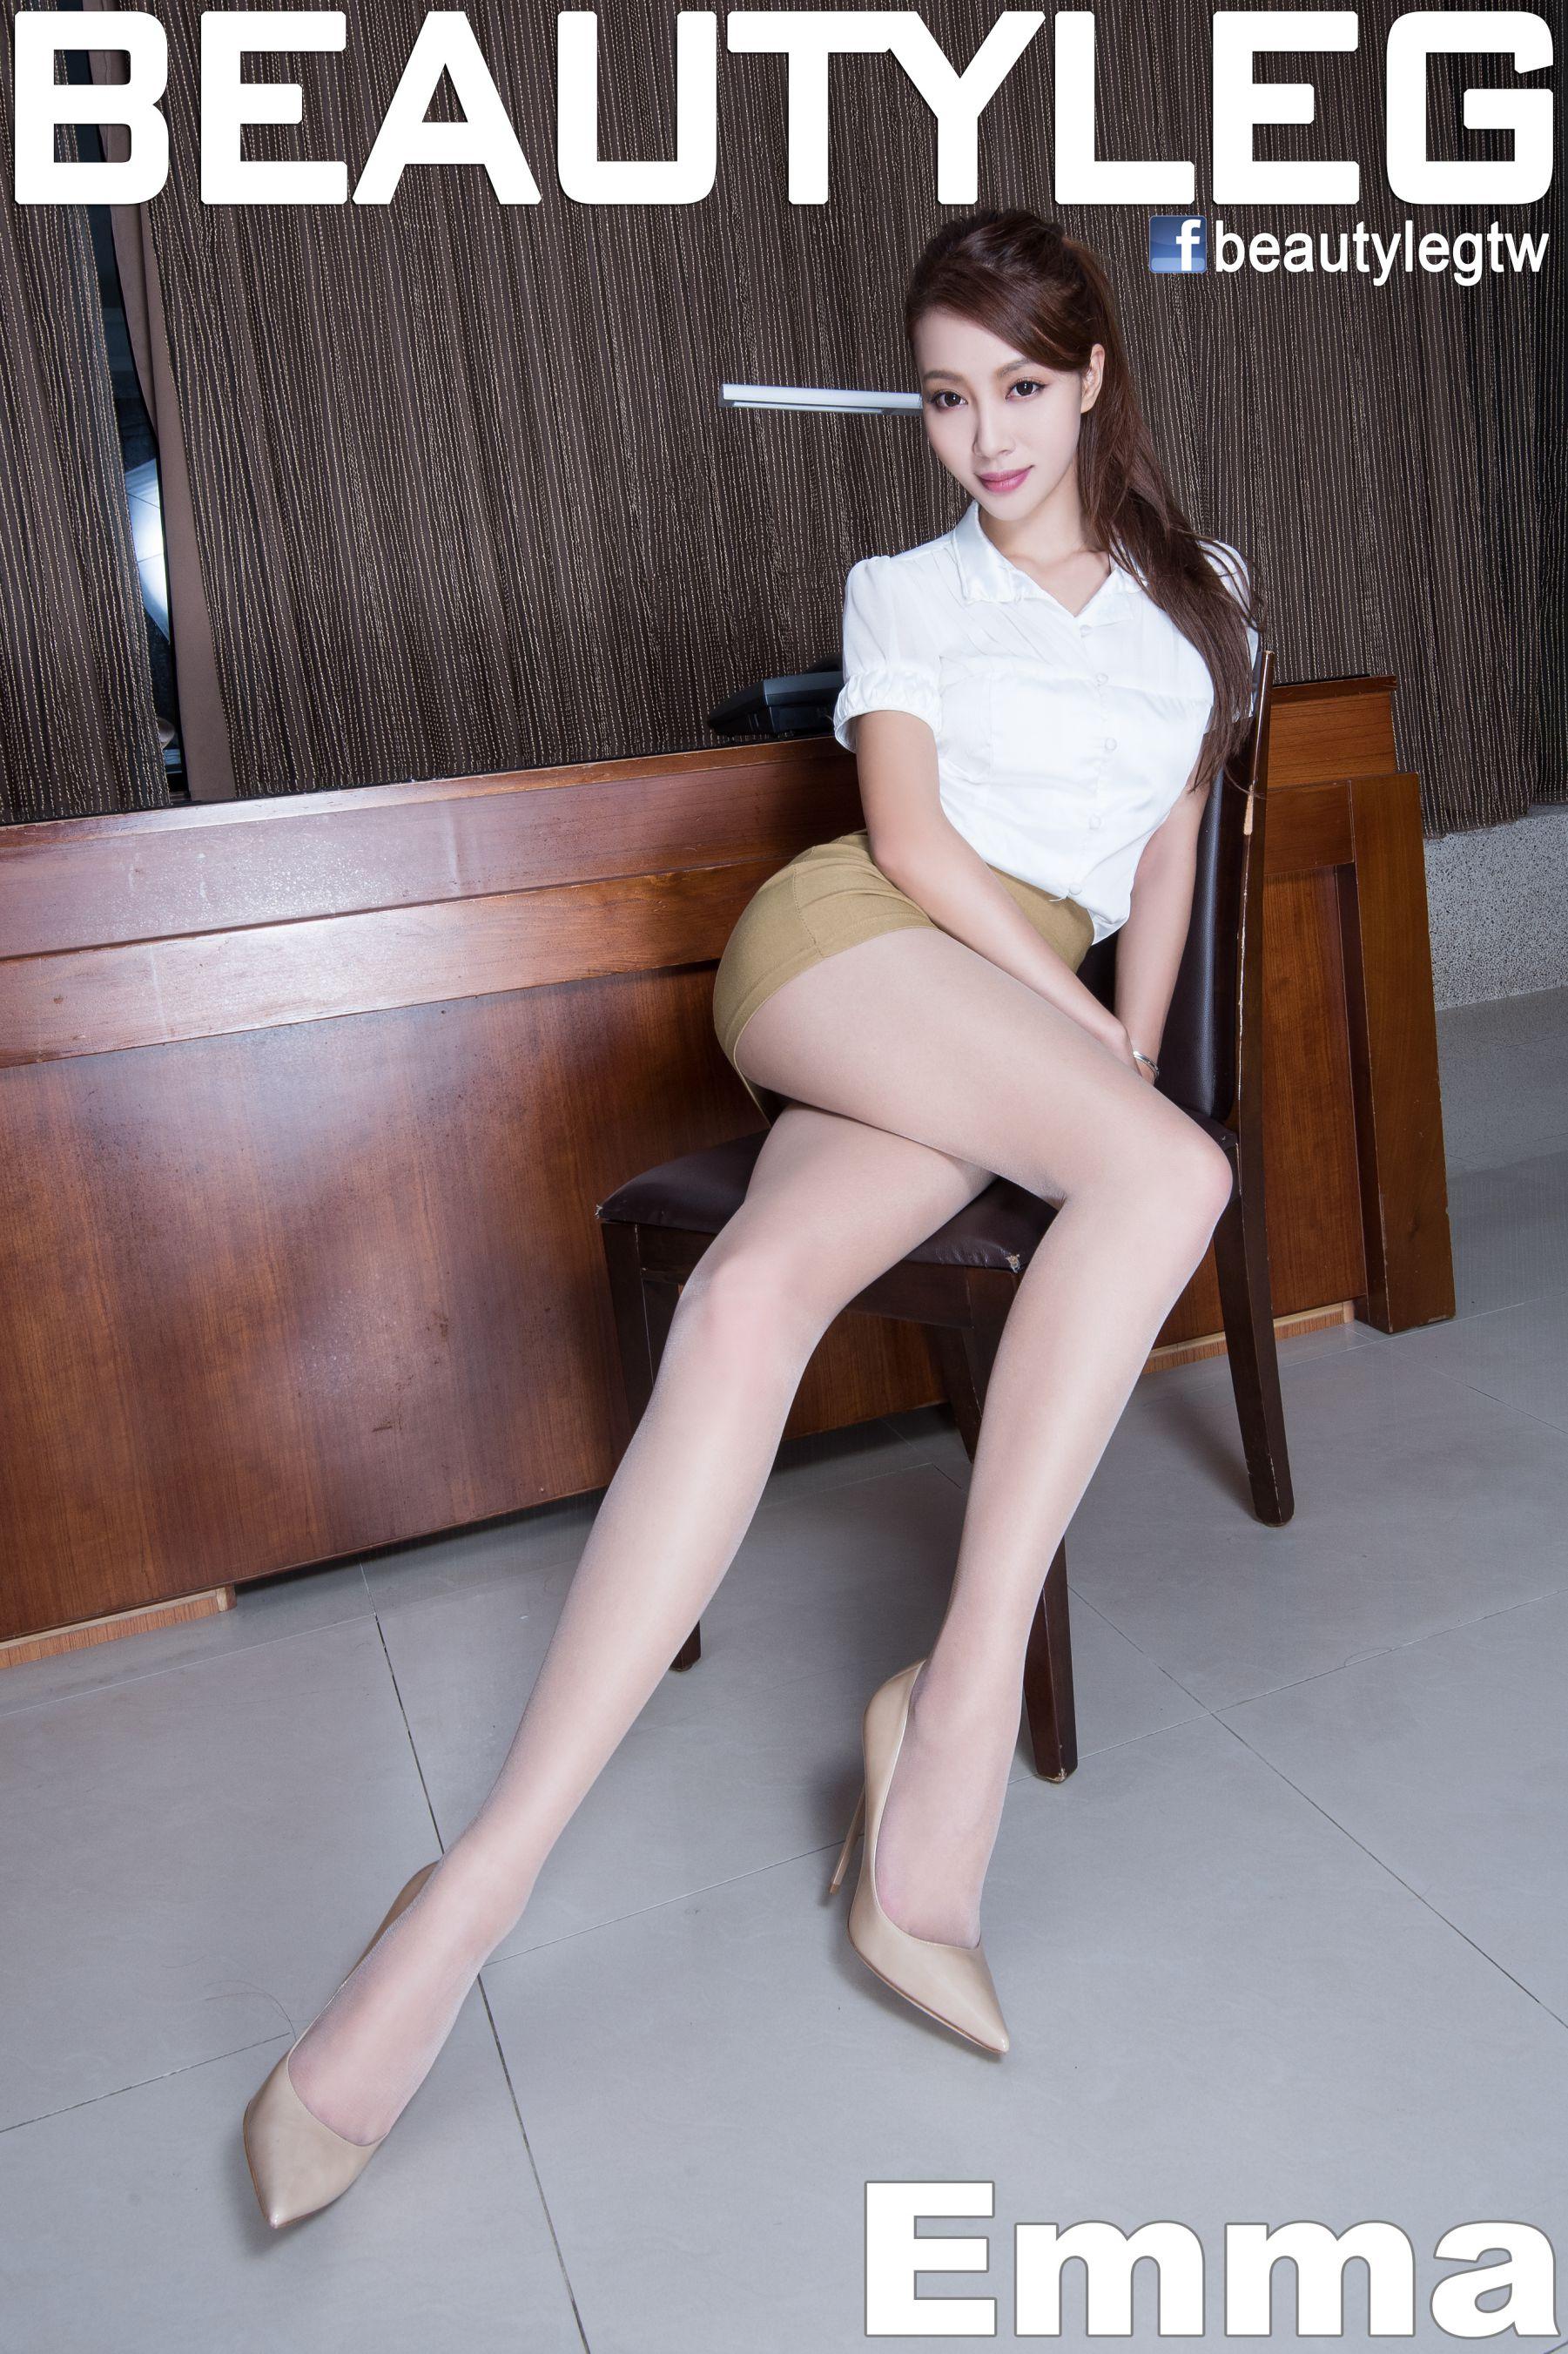 VOL.449 [Beautyleg]高跟美腿:江雨恩(腿模Emma,Emma玛儿)高品质写真套图(59P)